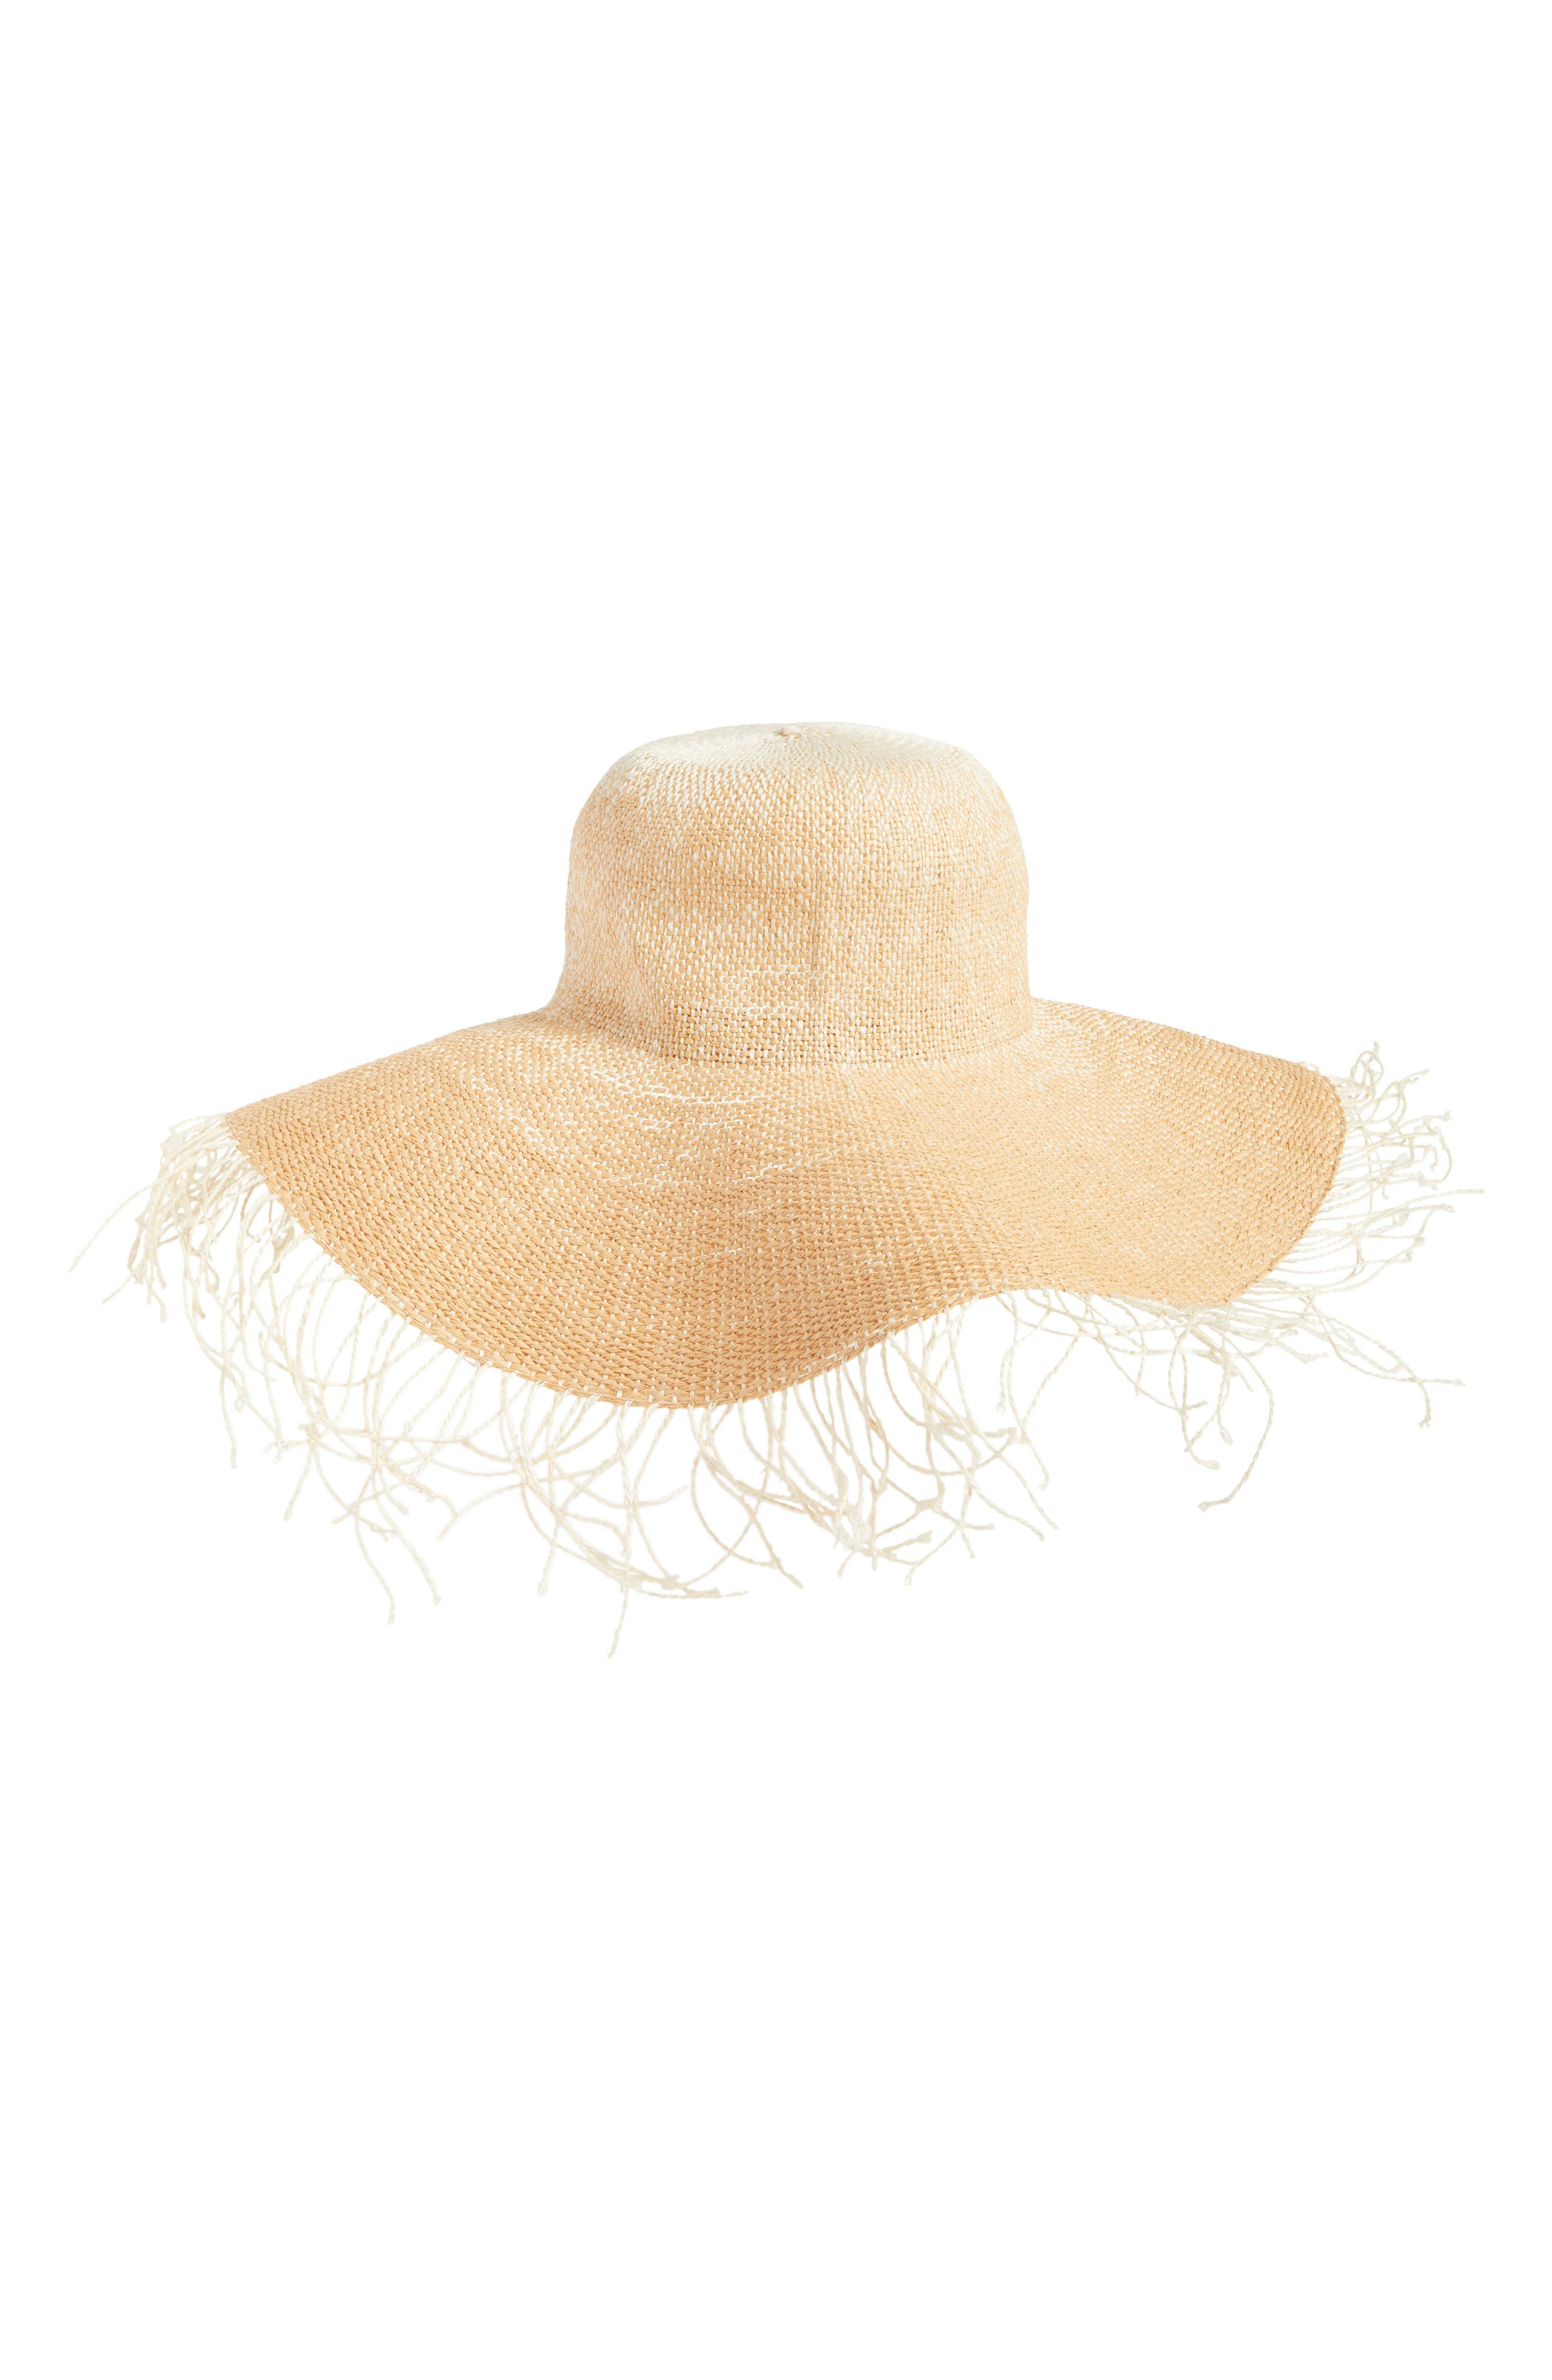 Fringe Ombré Floppy Straw Hat,                             Main thumbnail 1, color,